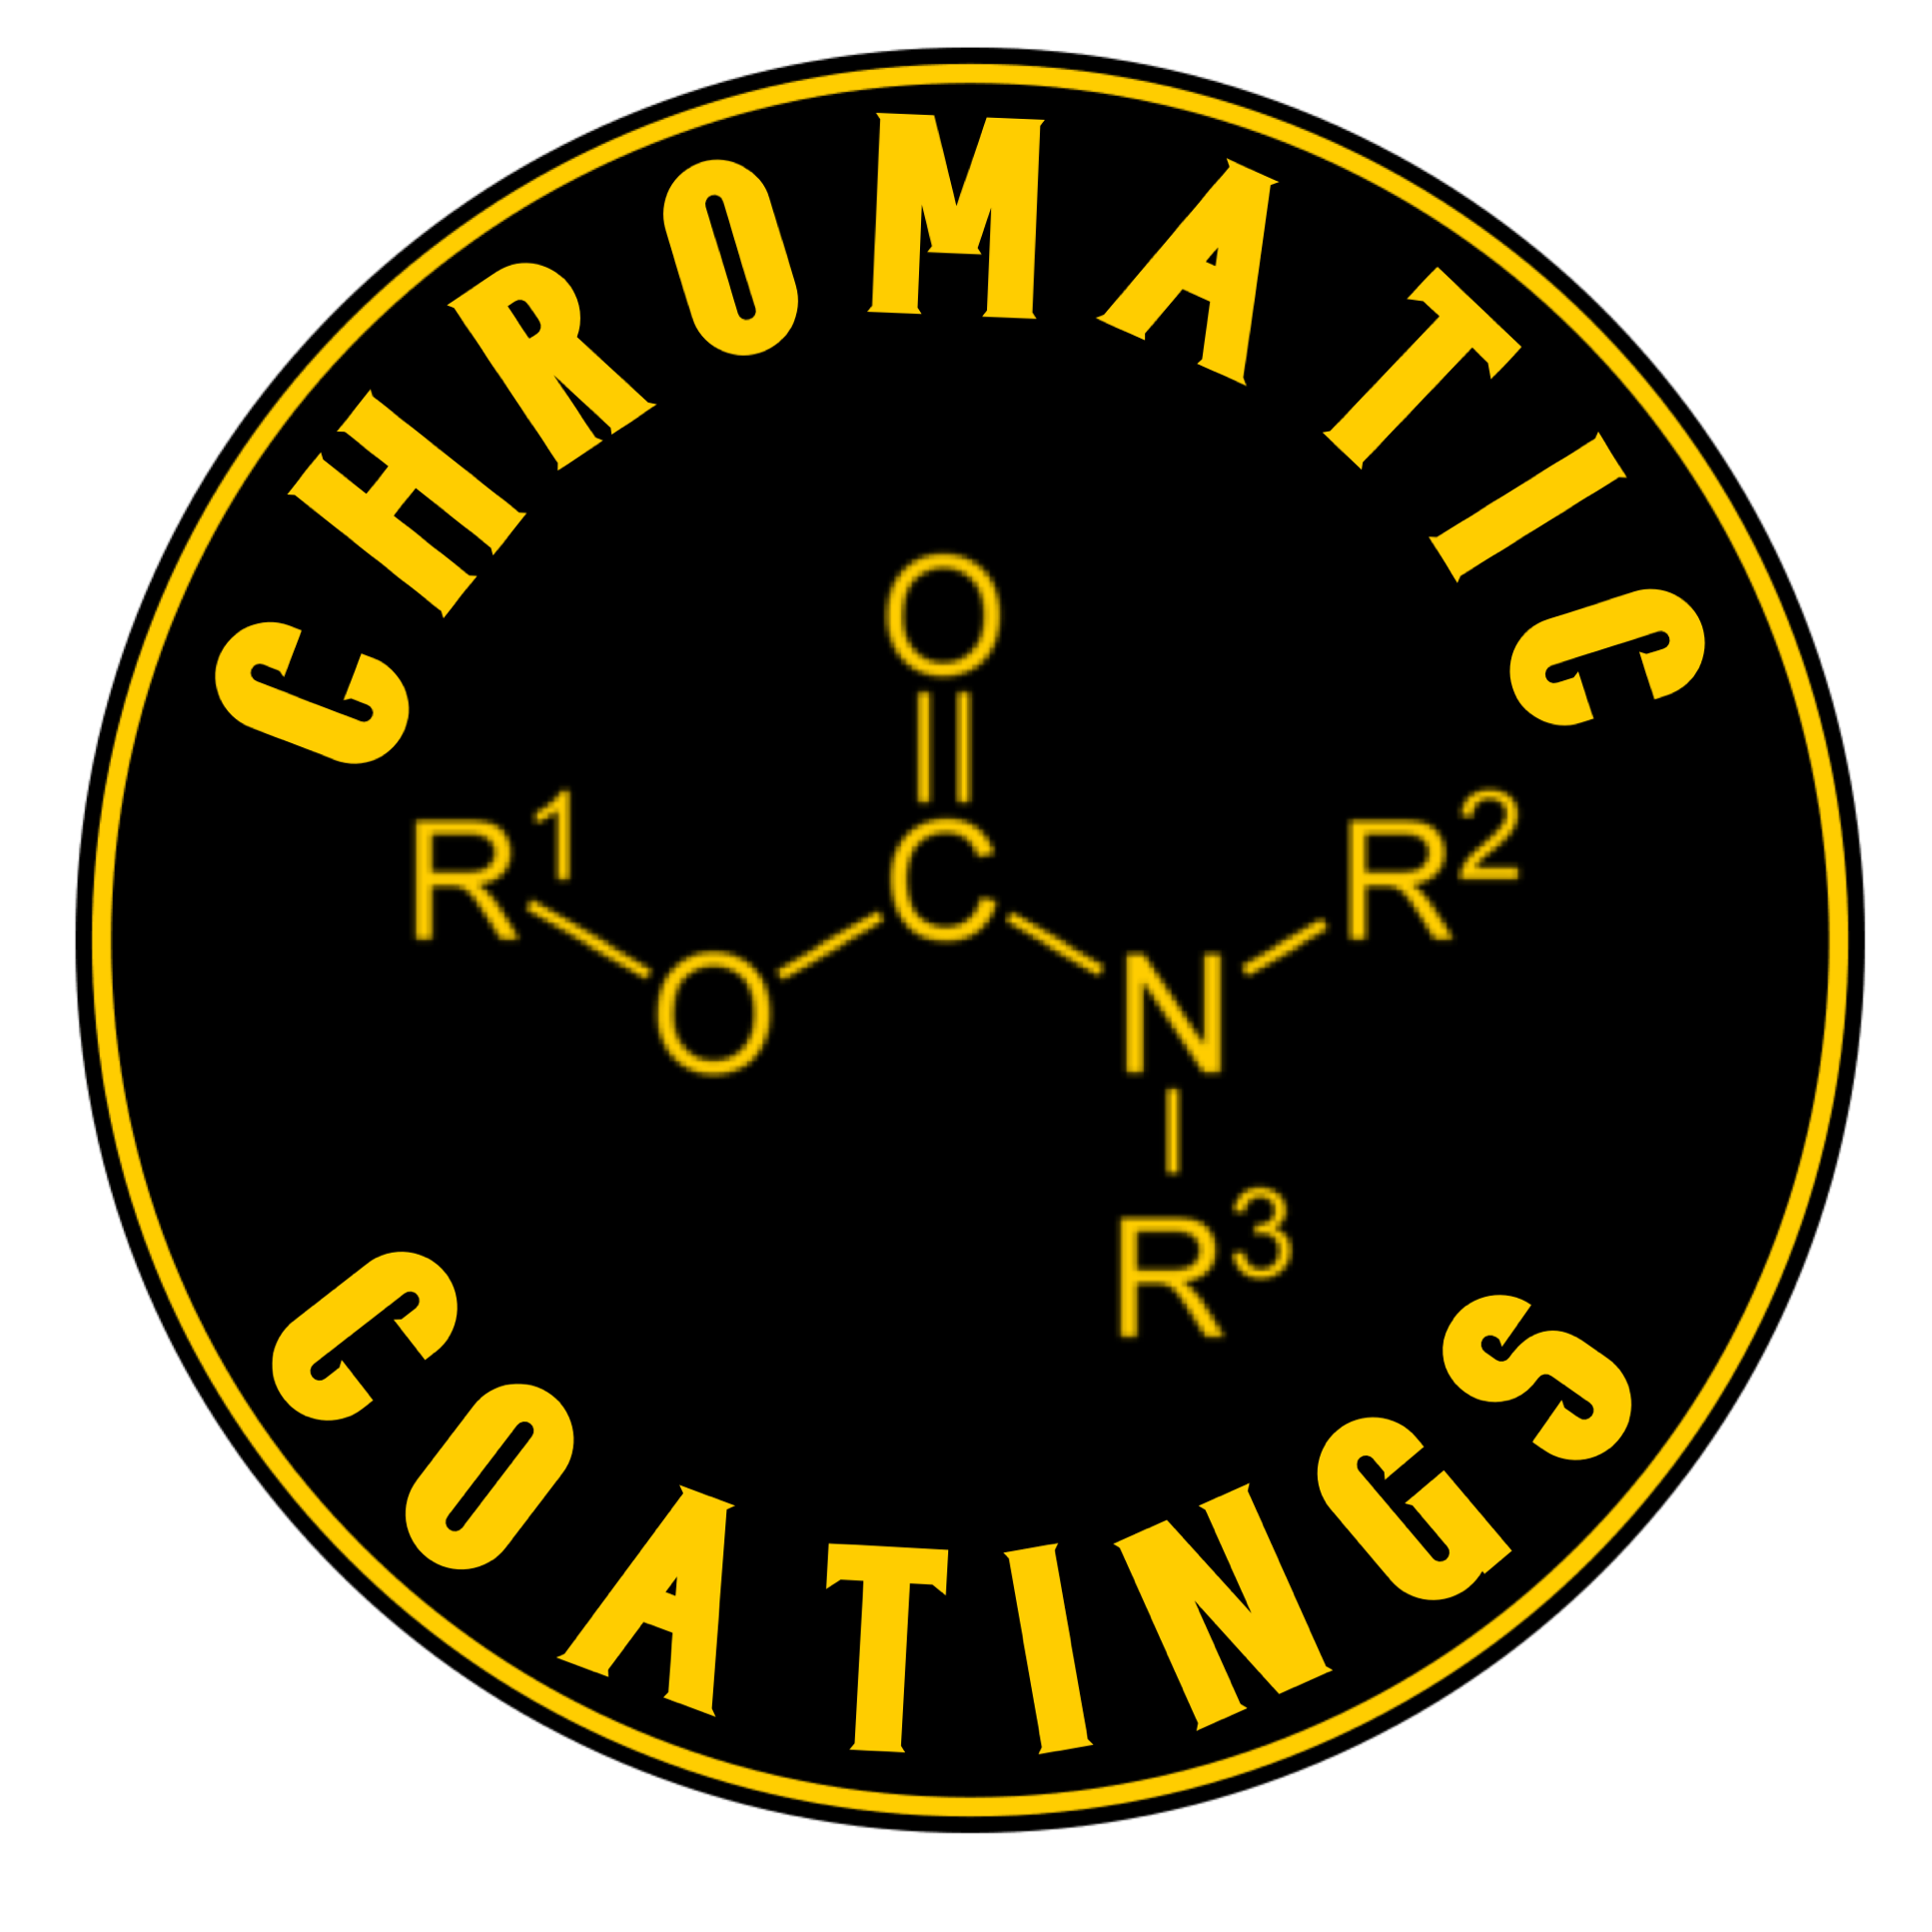 Chromatic Coatings